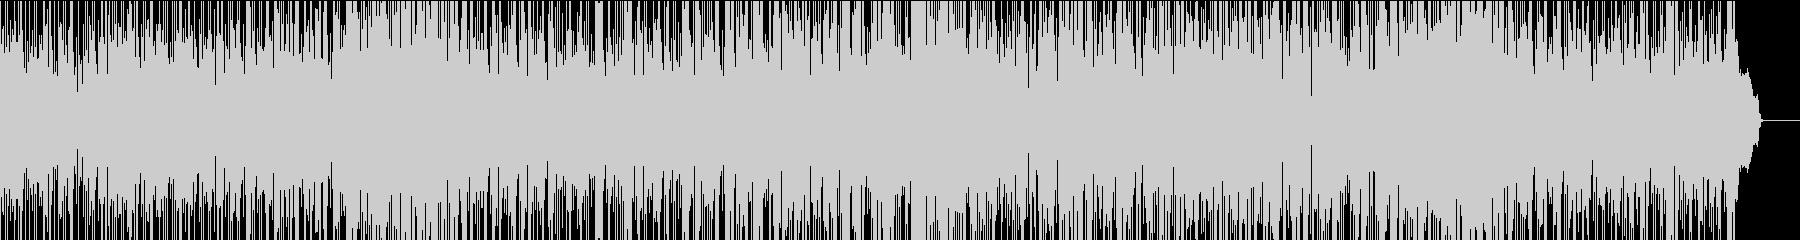 SAXソロのフージョンBGMの未再生の波形